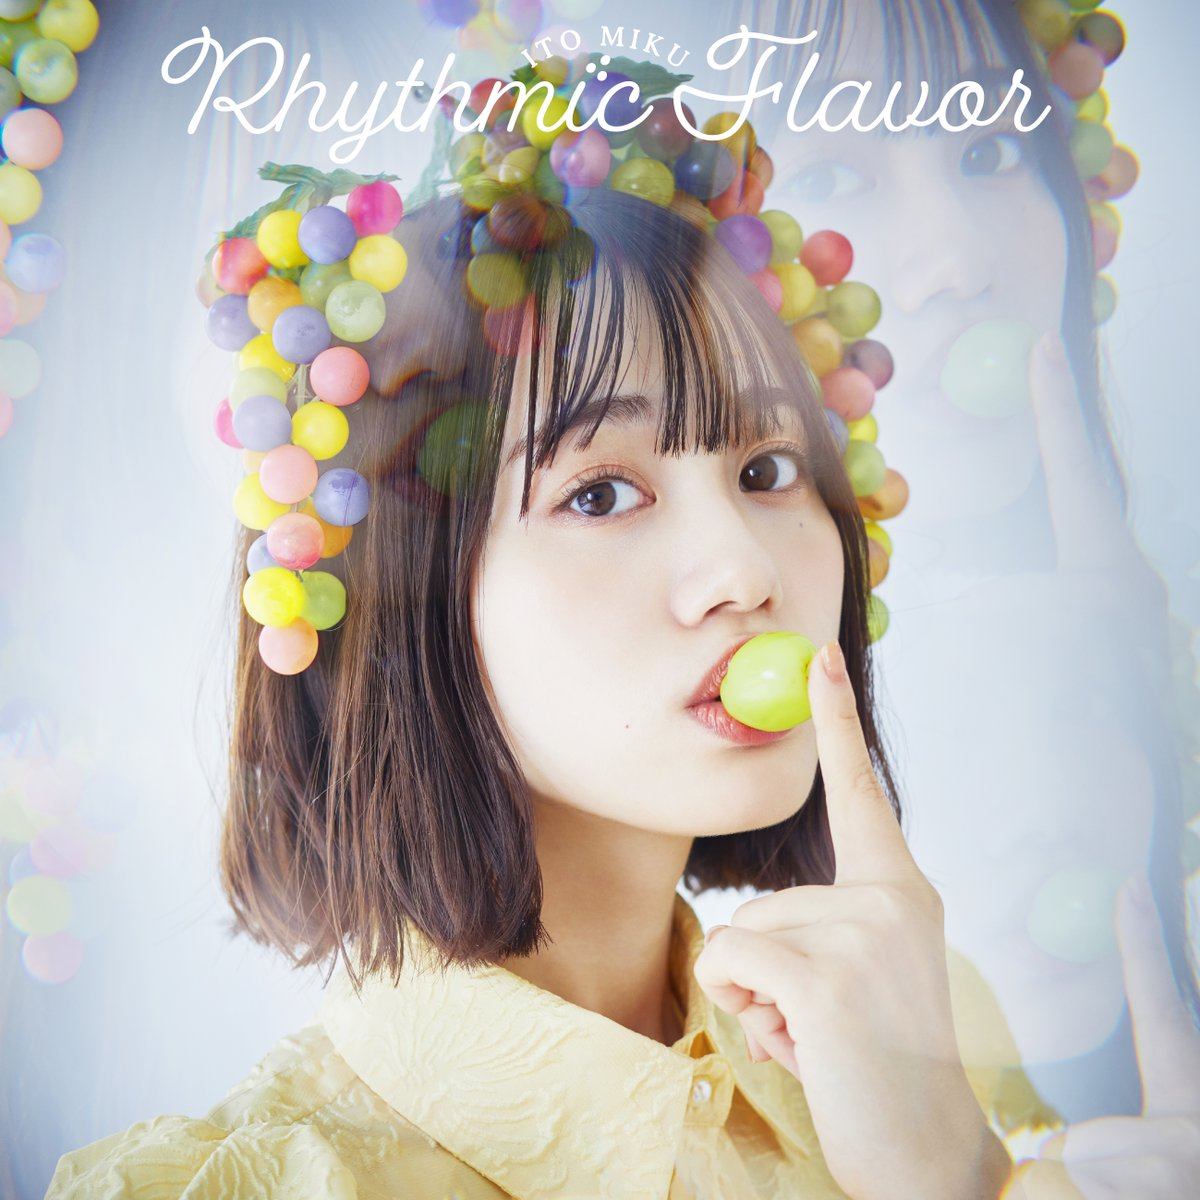 伊藤美来 - Rhythmic Flavor [2020.12.23+MP3+RAR]